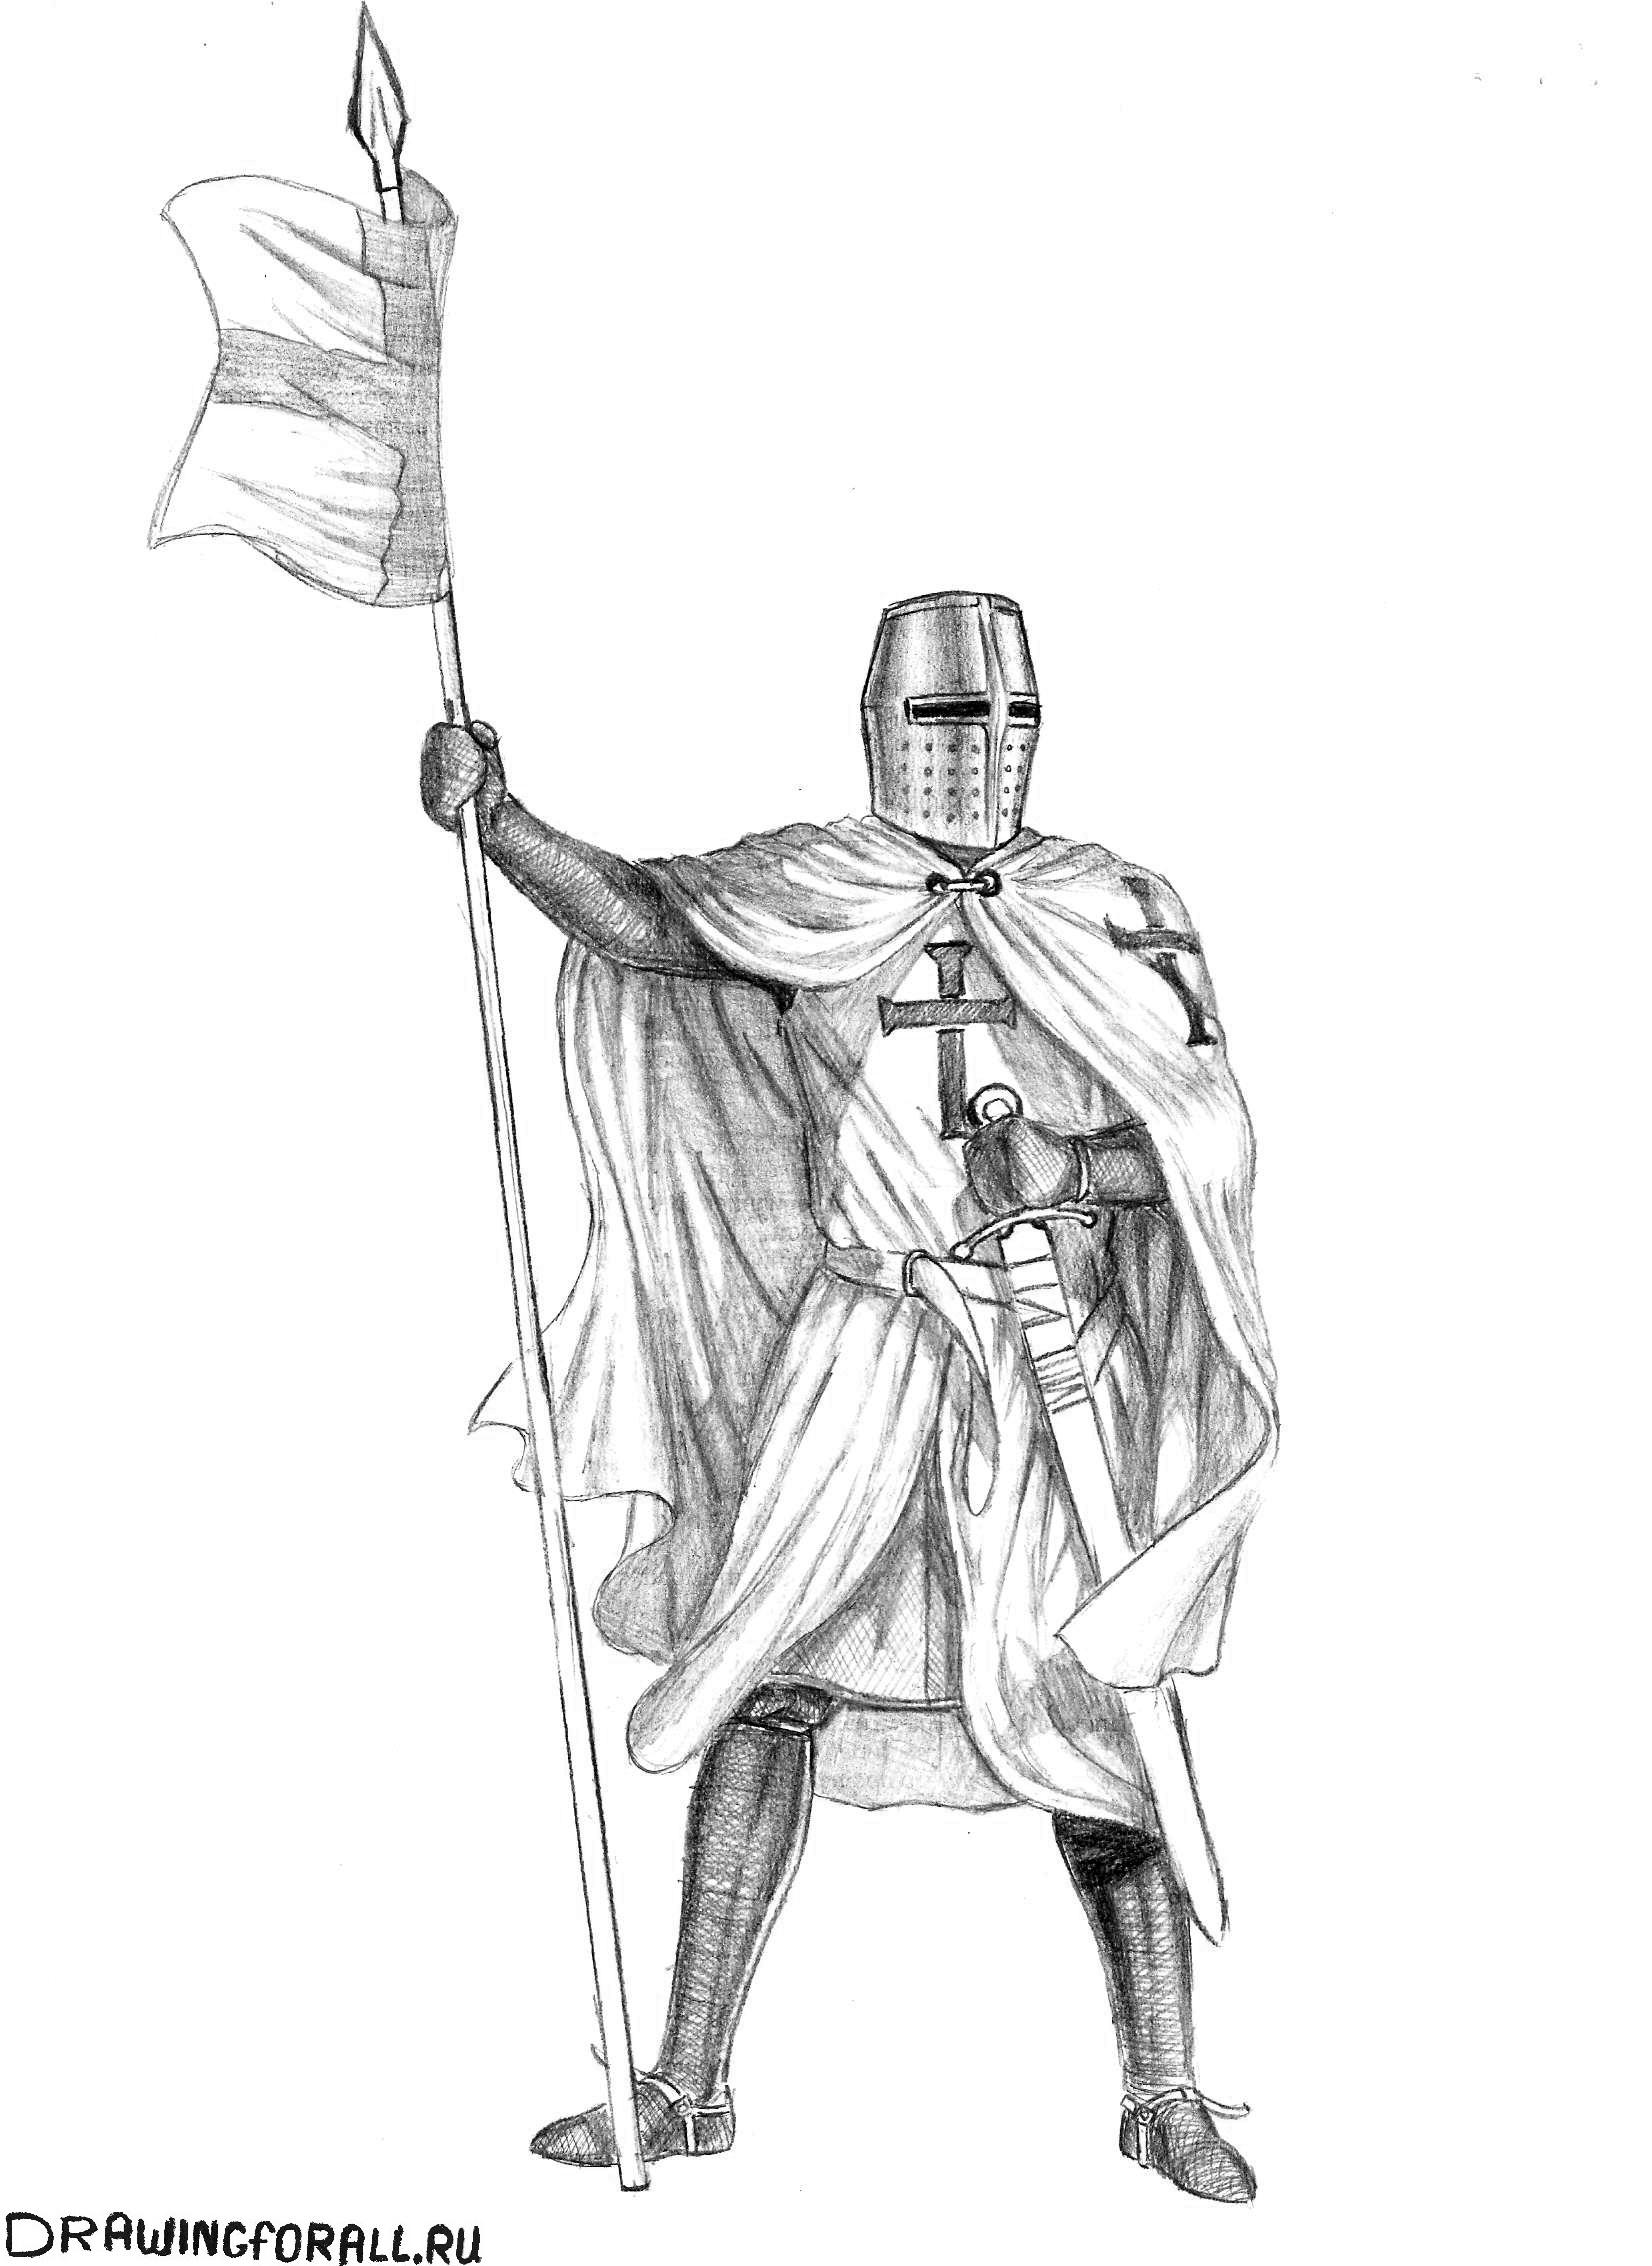 Рисуем рыцаря из сказок поэтапно карандашом